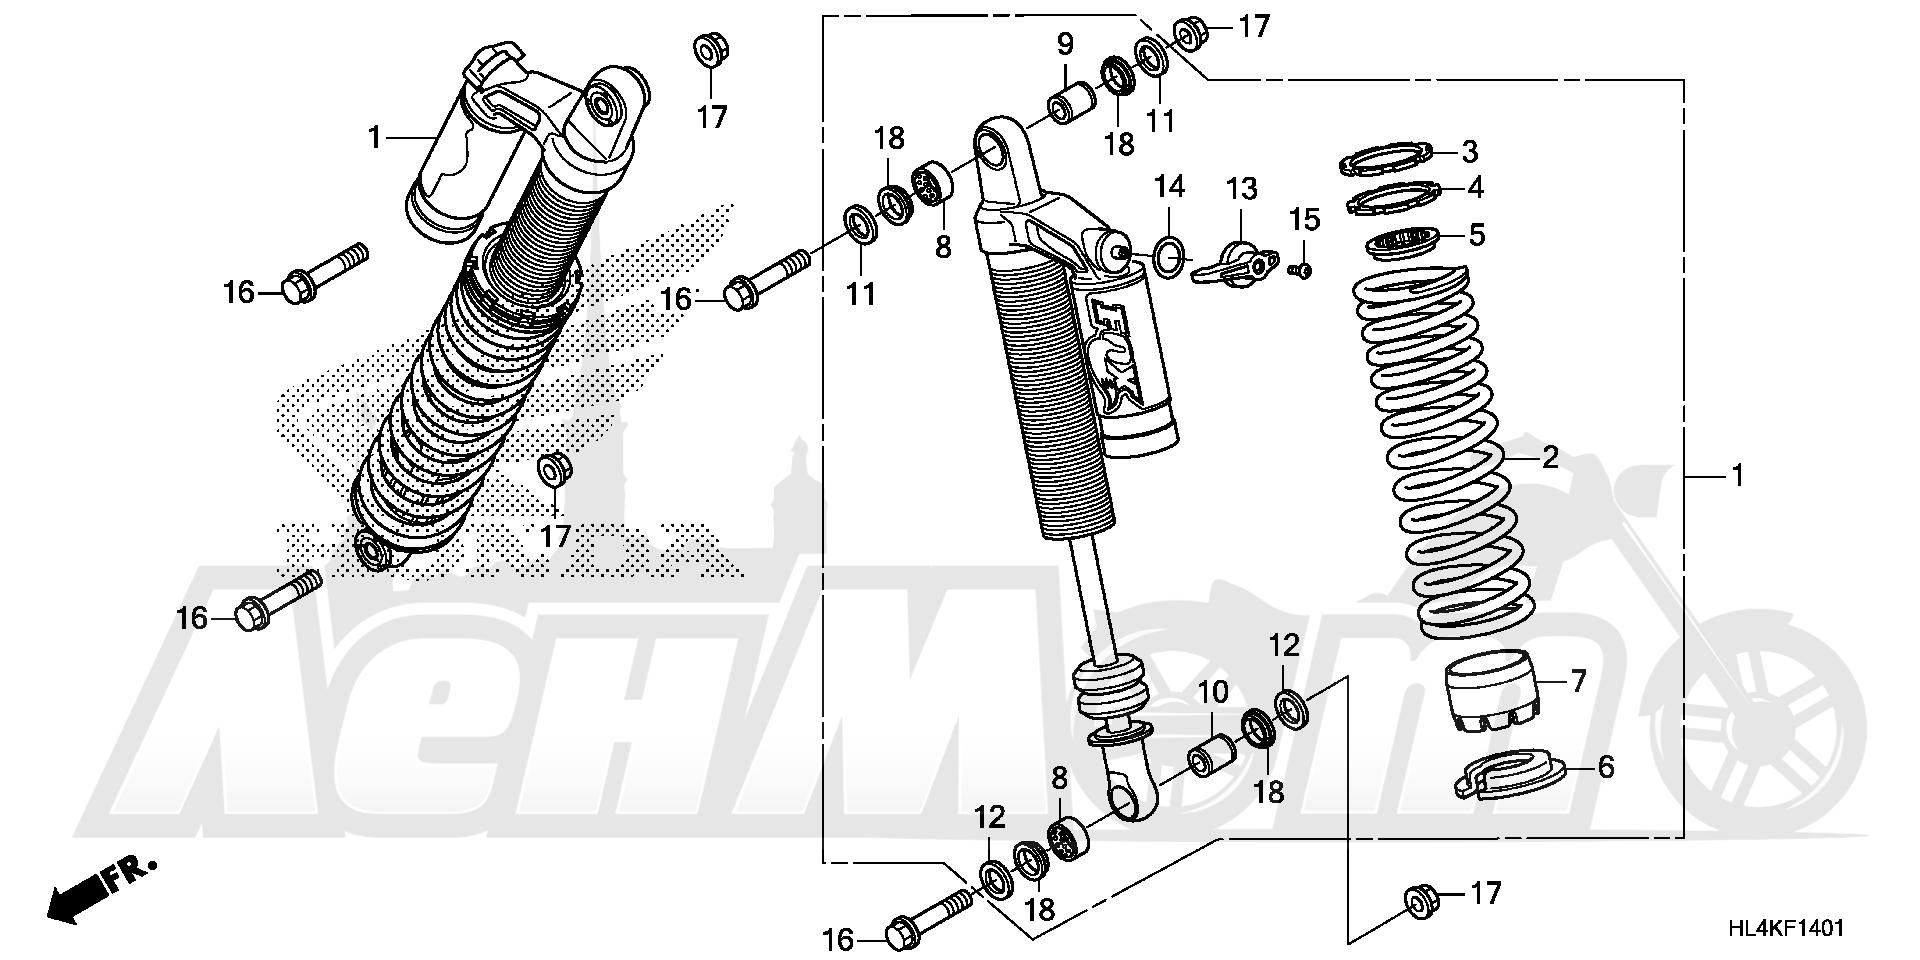 Запчасти для Квадроцикла Honda 2019 SXS1000M3P Раздел: FRONT CUSHION (2) | перед подкладка (2)